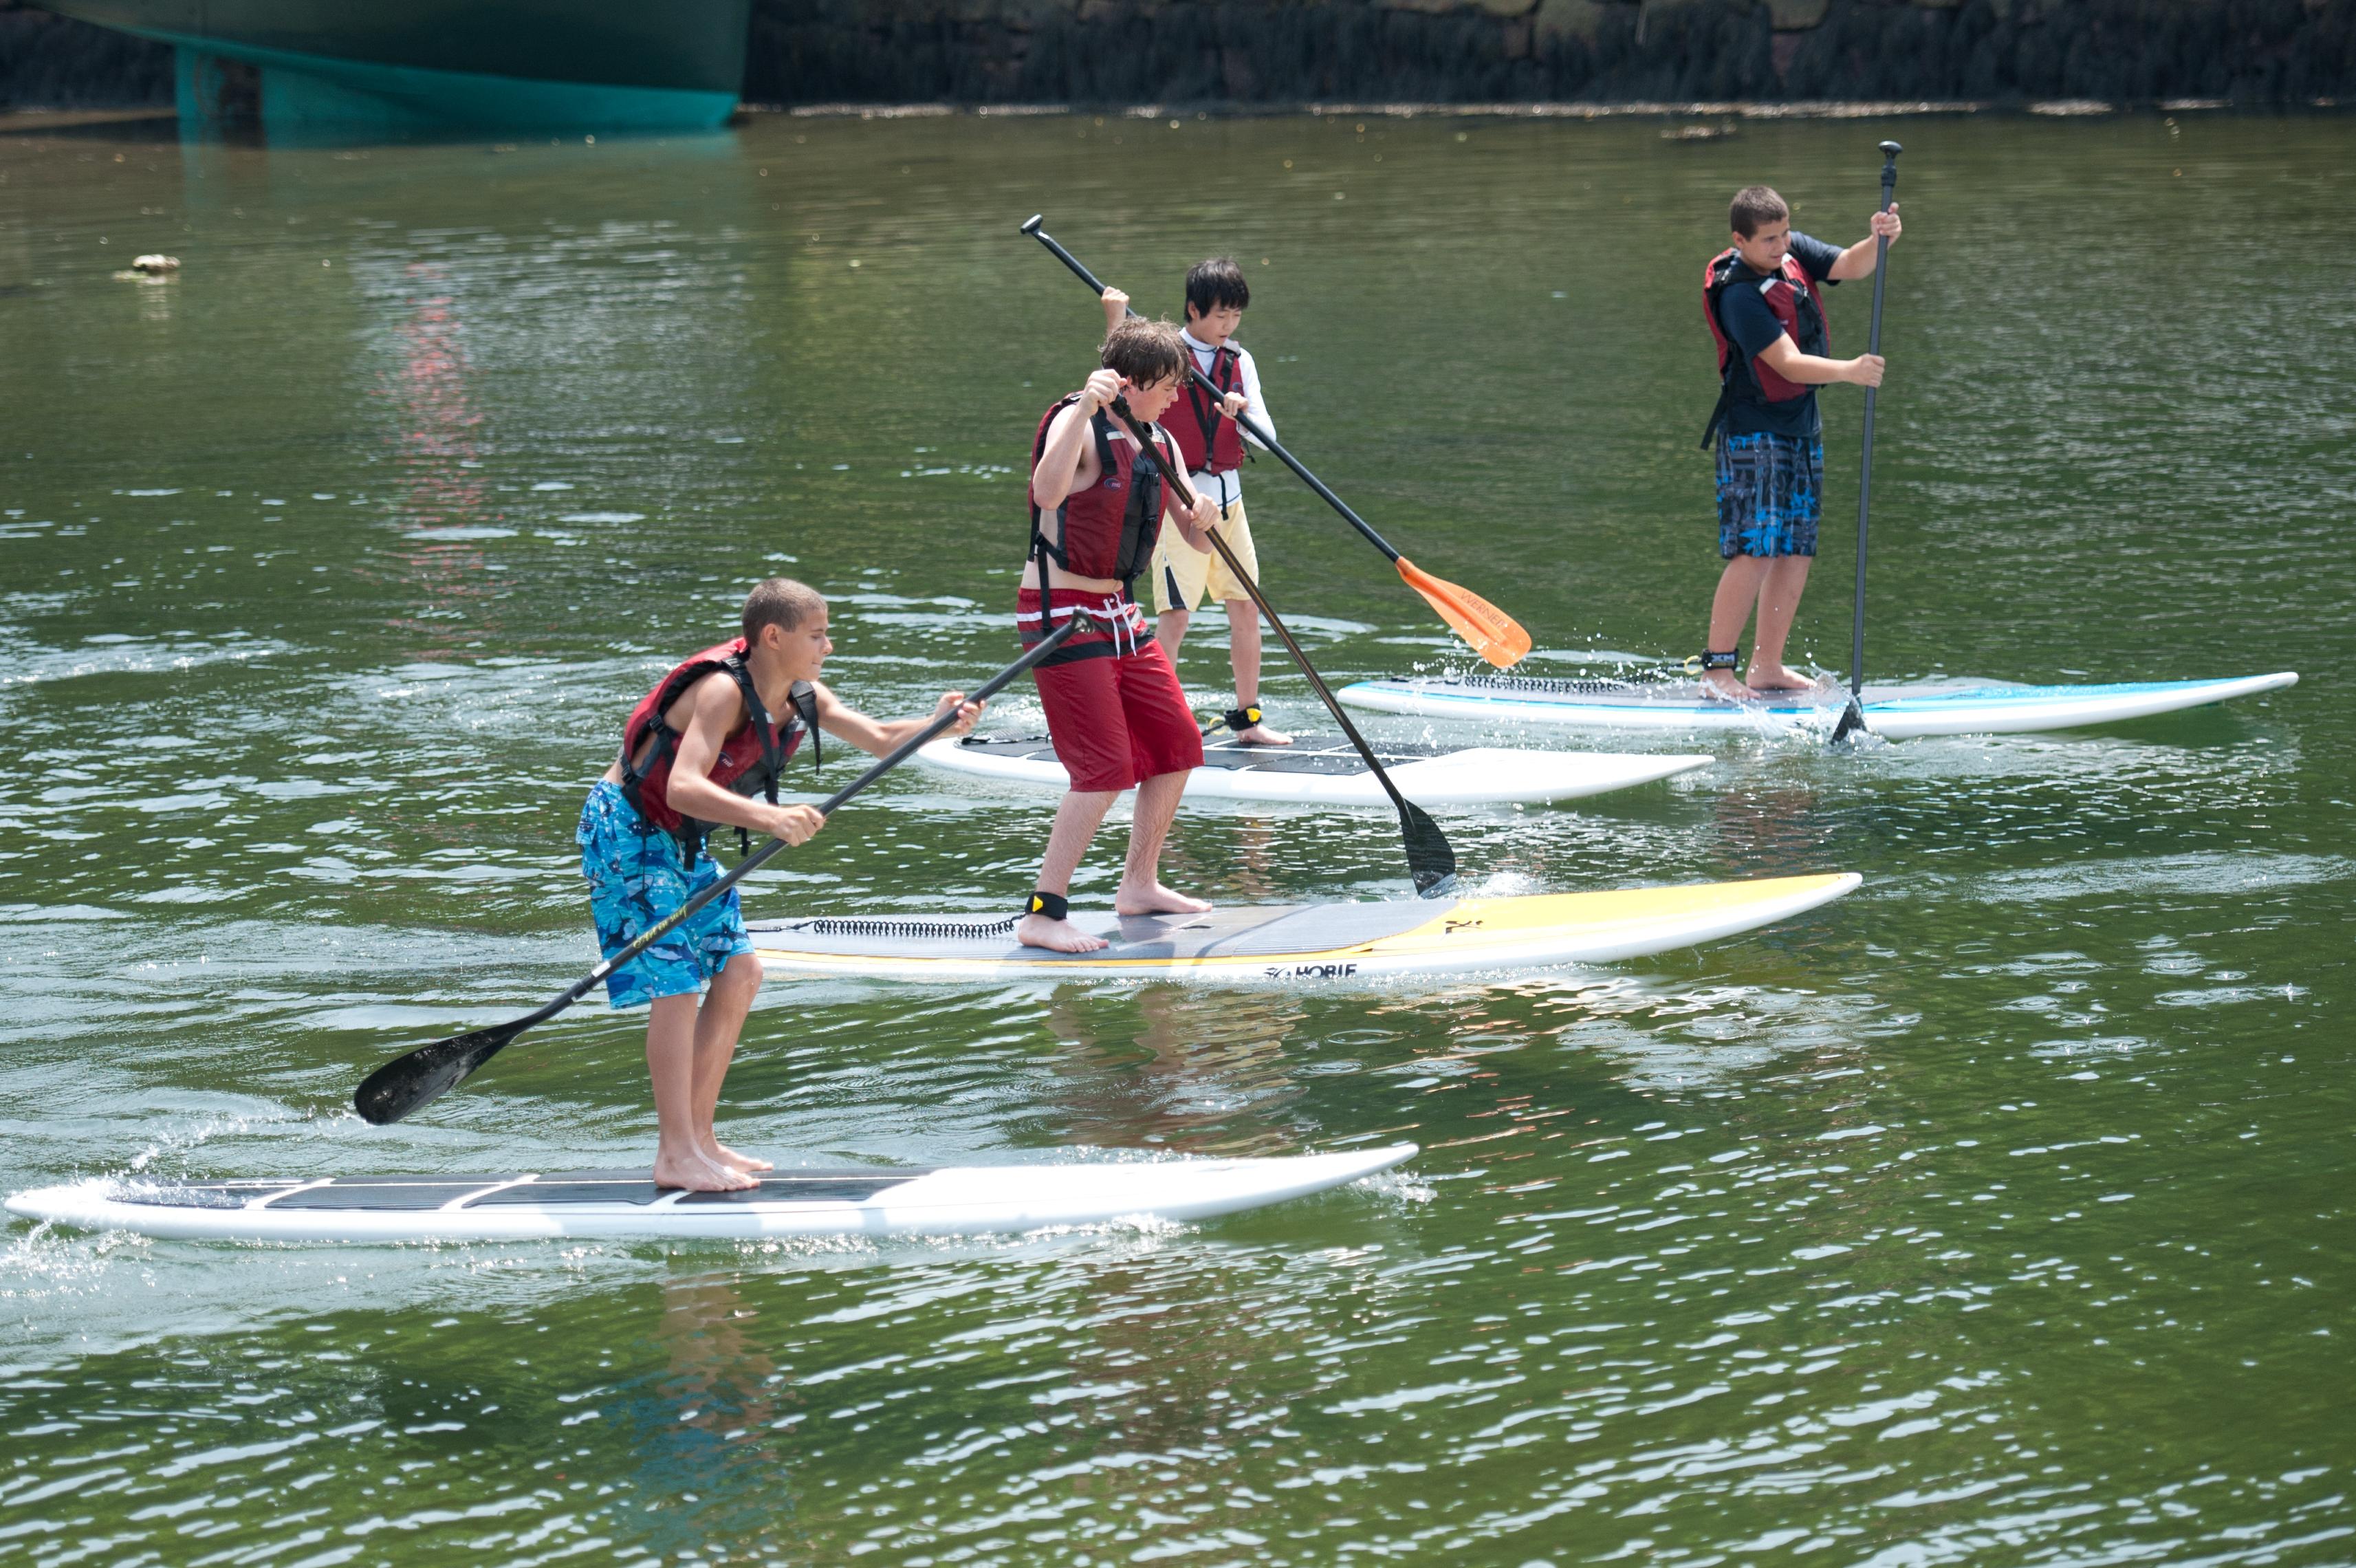 Summer Program - Kayaking | Beaver Summer Camp: Extreme Sports